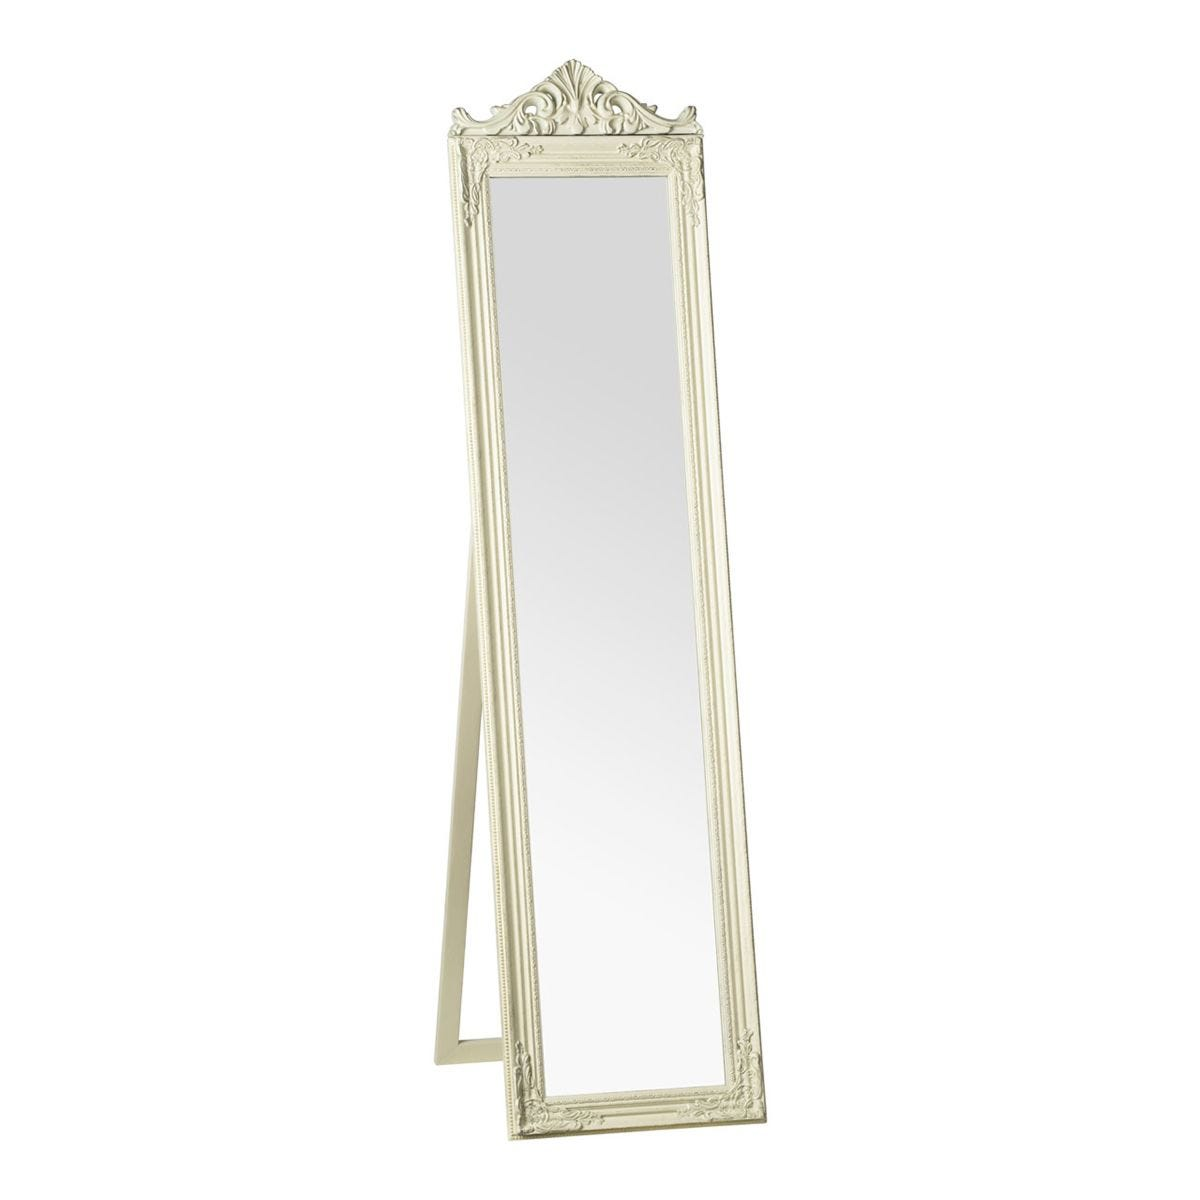 Premier Housewares Boudoir Standing Mirror- Cream/Gold